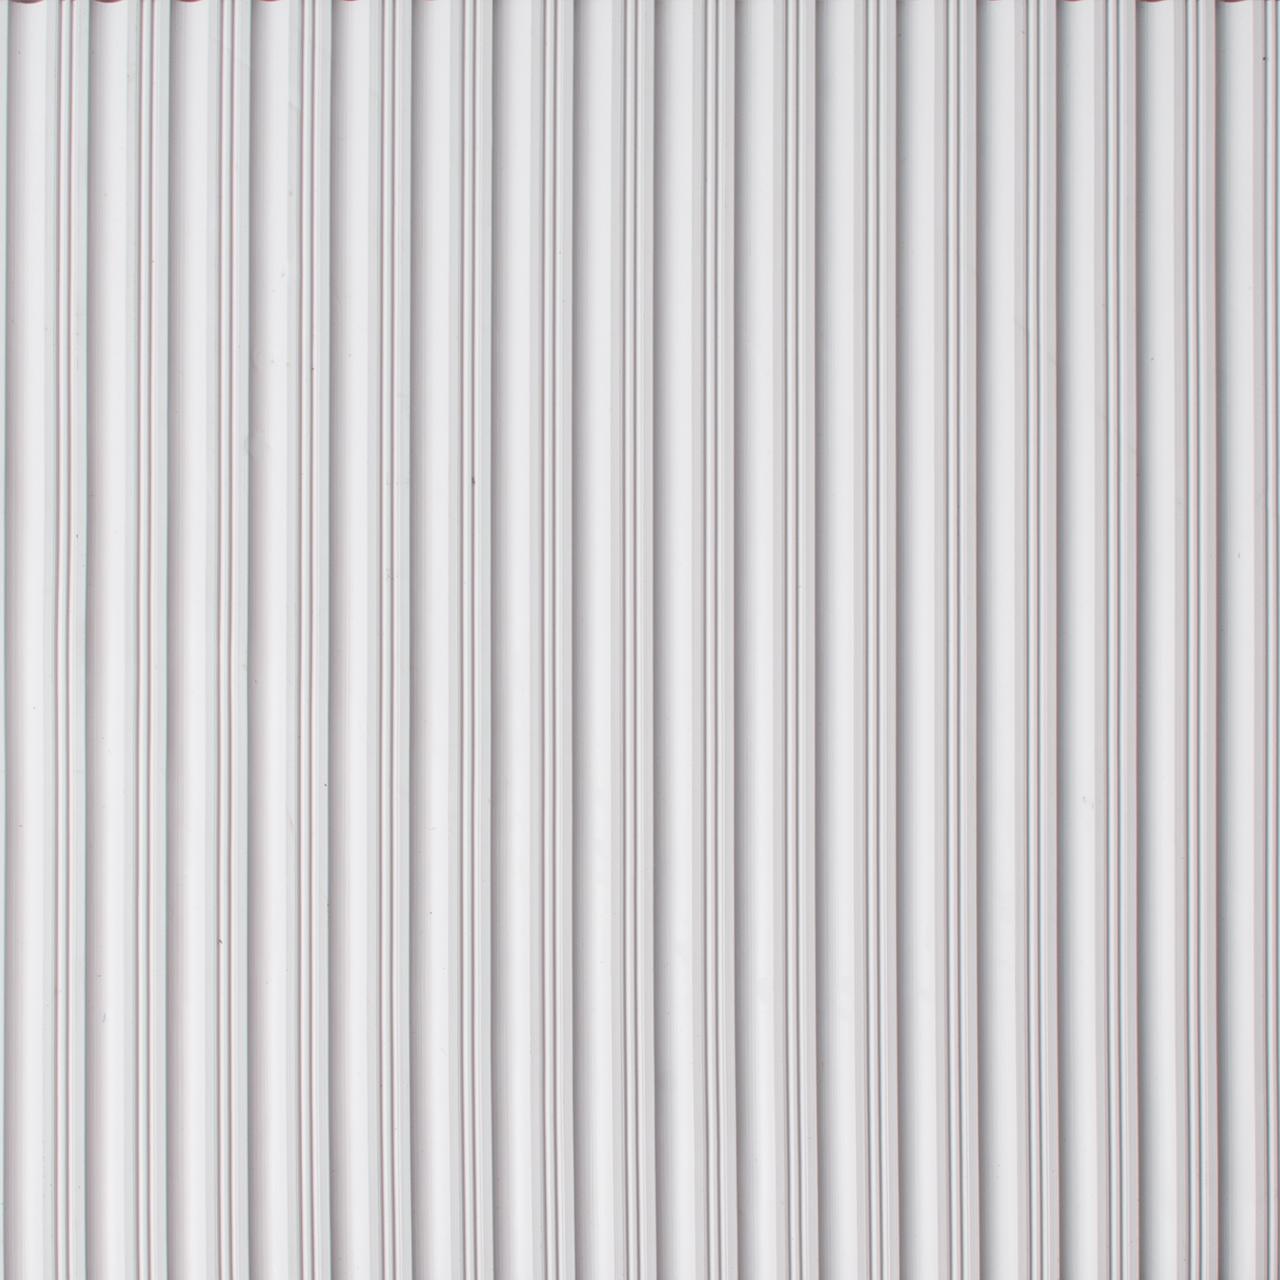 Drainage Matting | Ribbed Mat | Flat Rib White